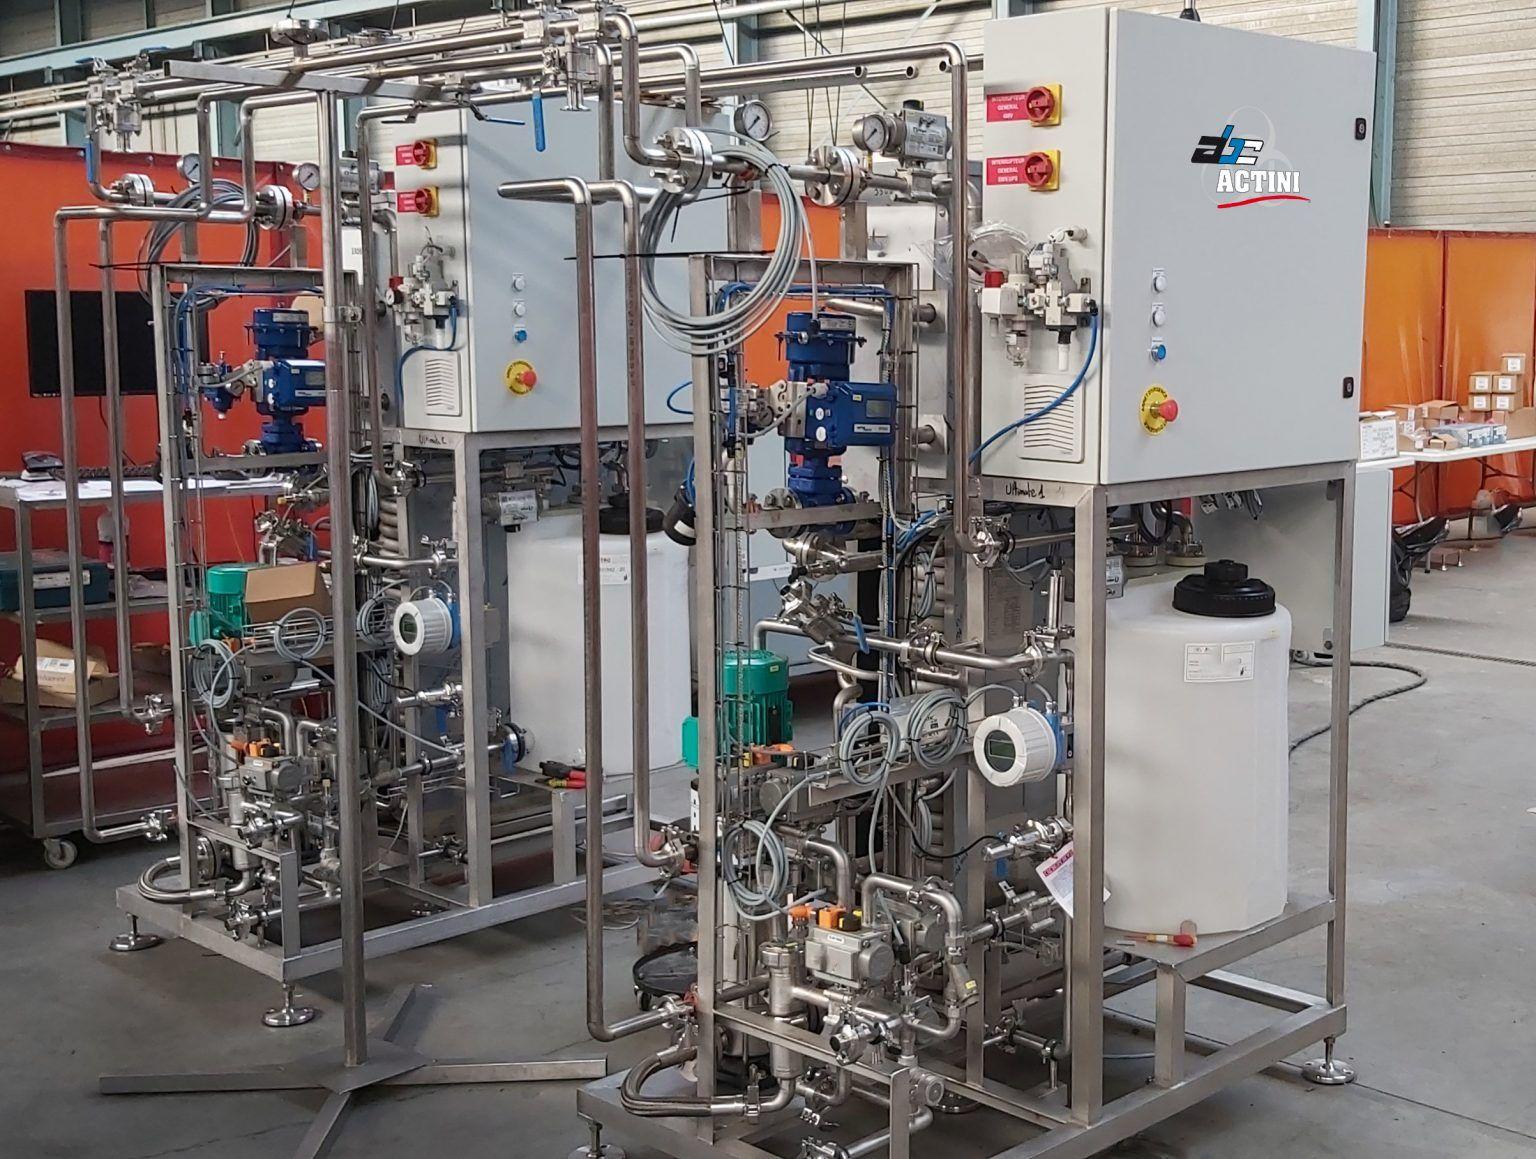 ULTIMATE 1000 x2 - ABC Actini - mass production - stock